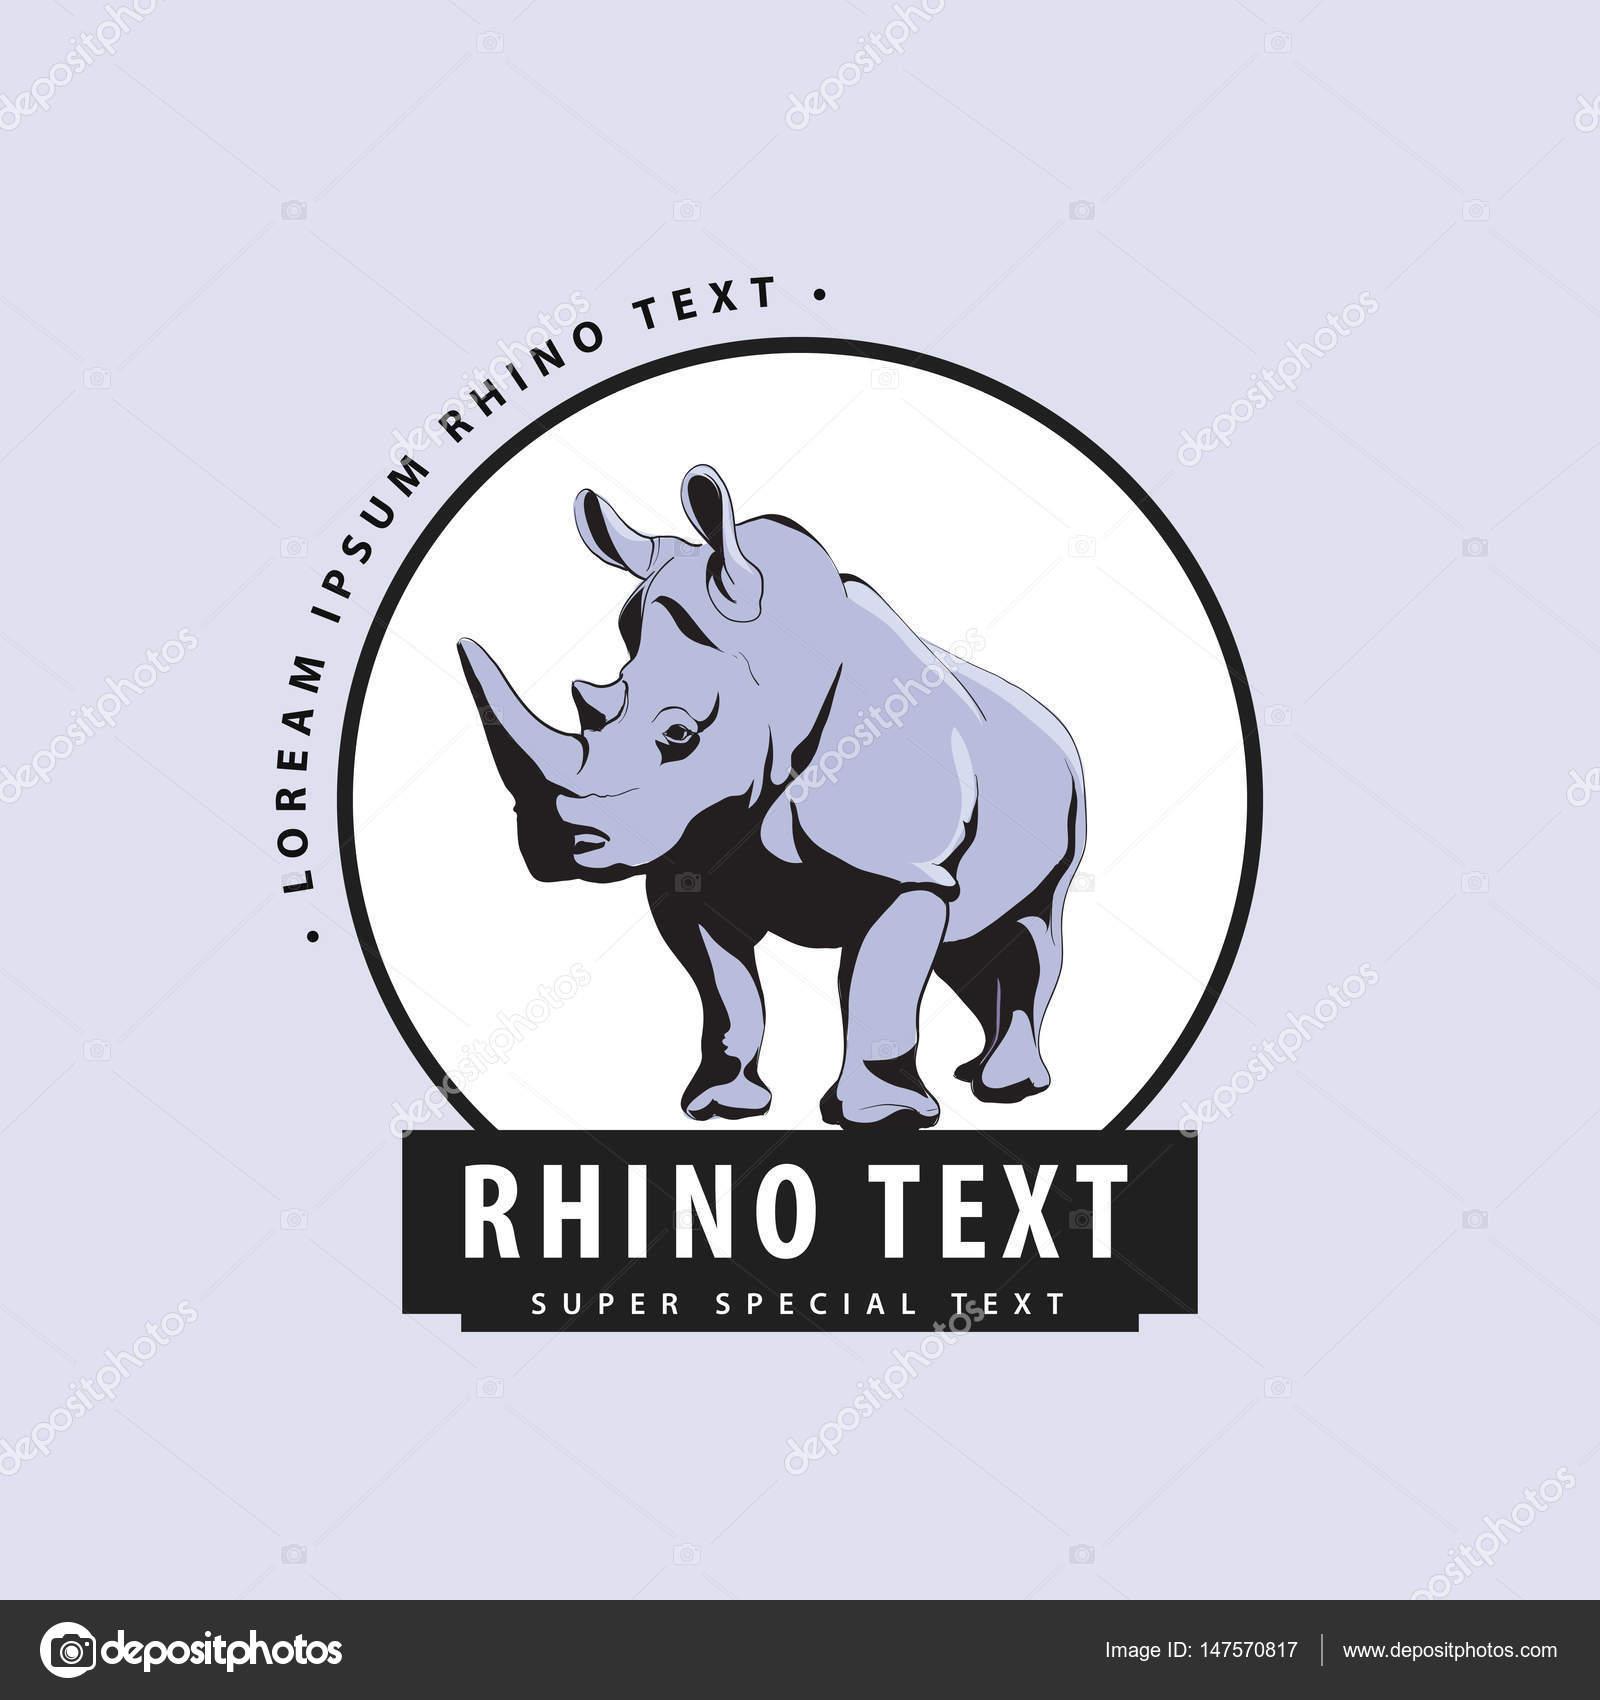 Rhino Logo Fashion Designer Designer Logo With Rhinoceros On A Blue Background Stock Vector C Chisnikov 147570817